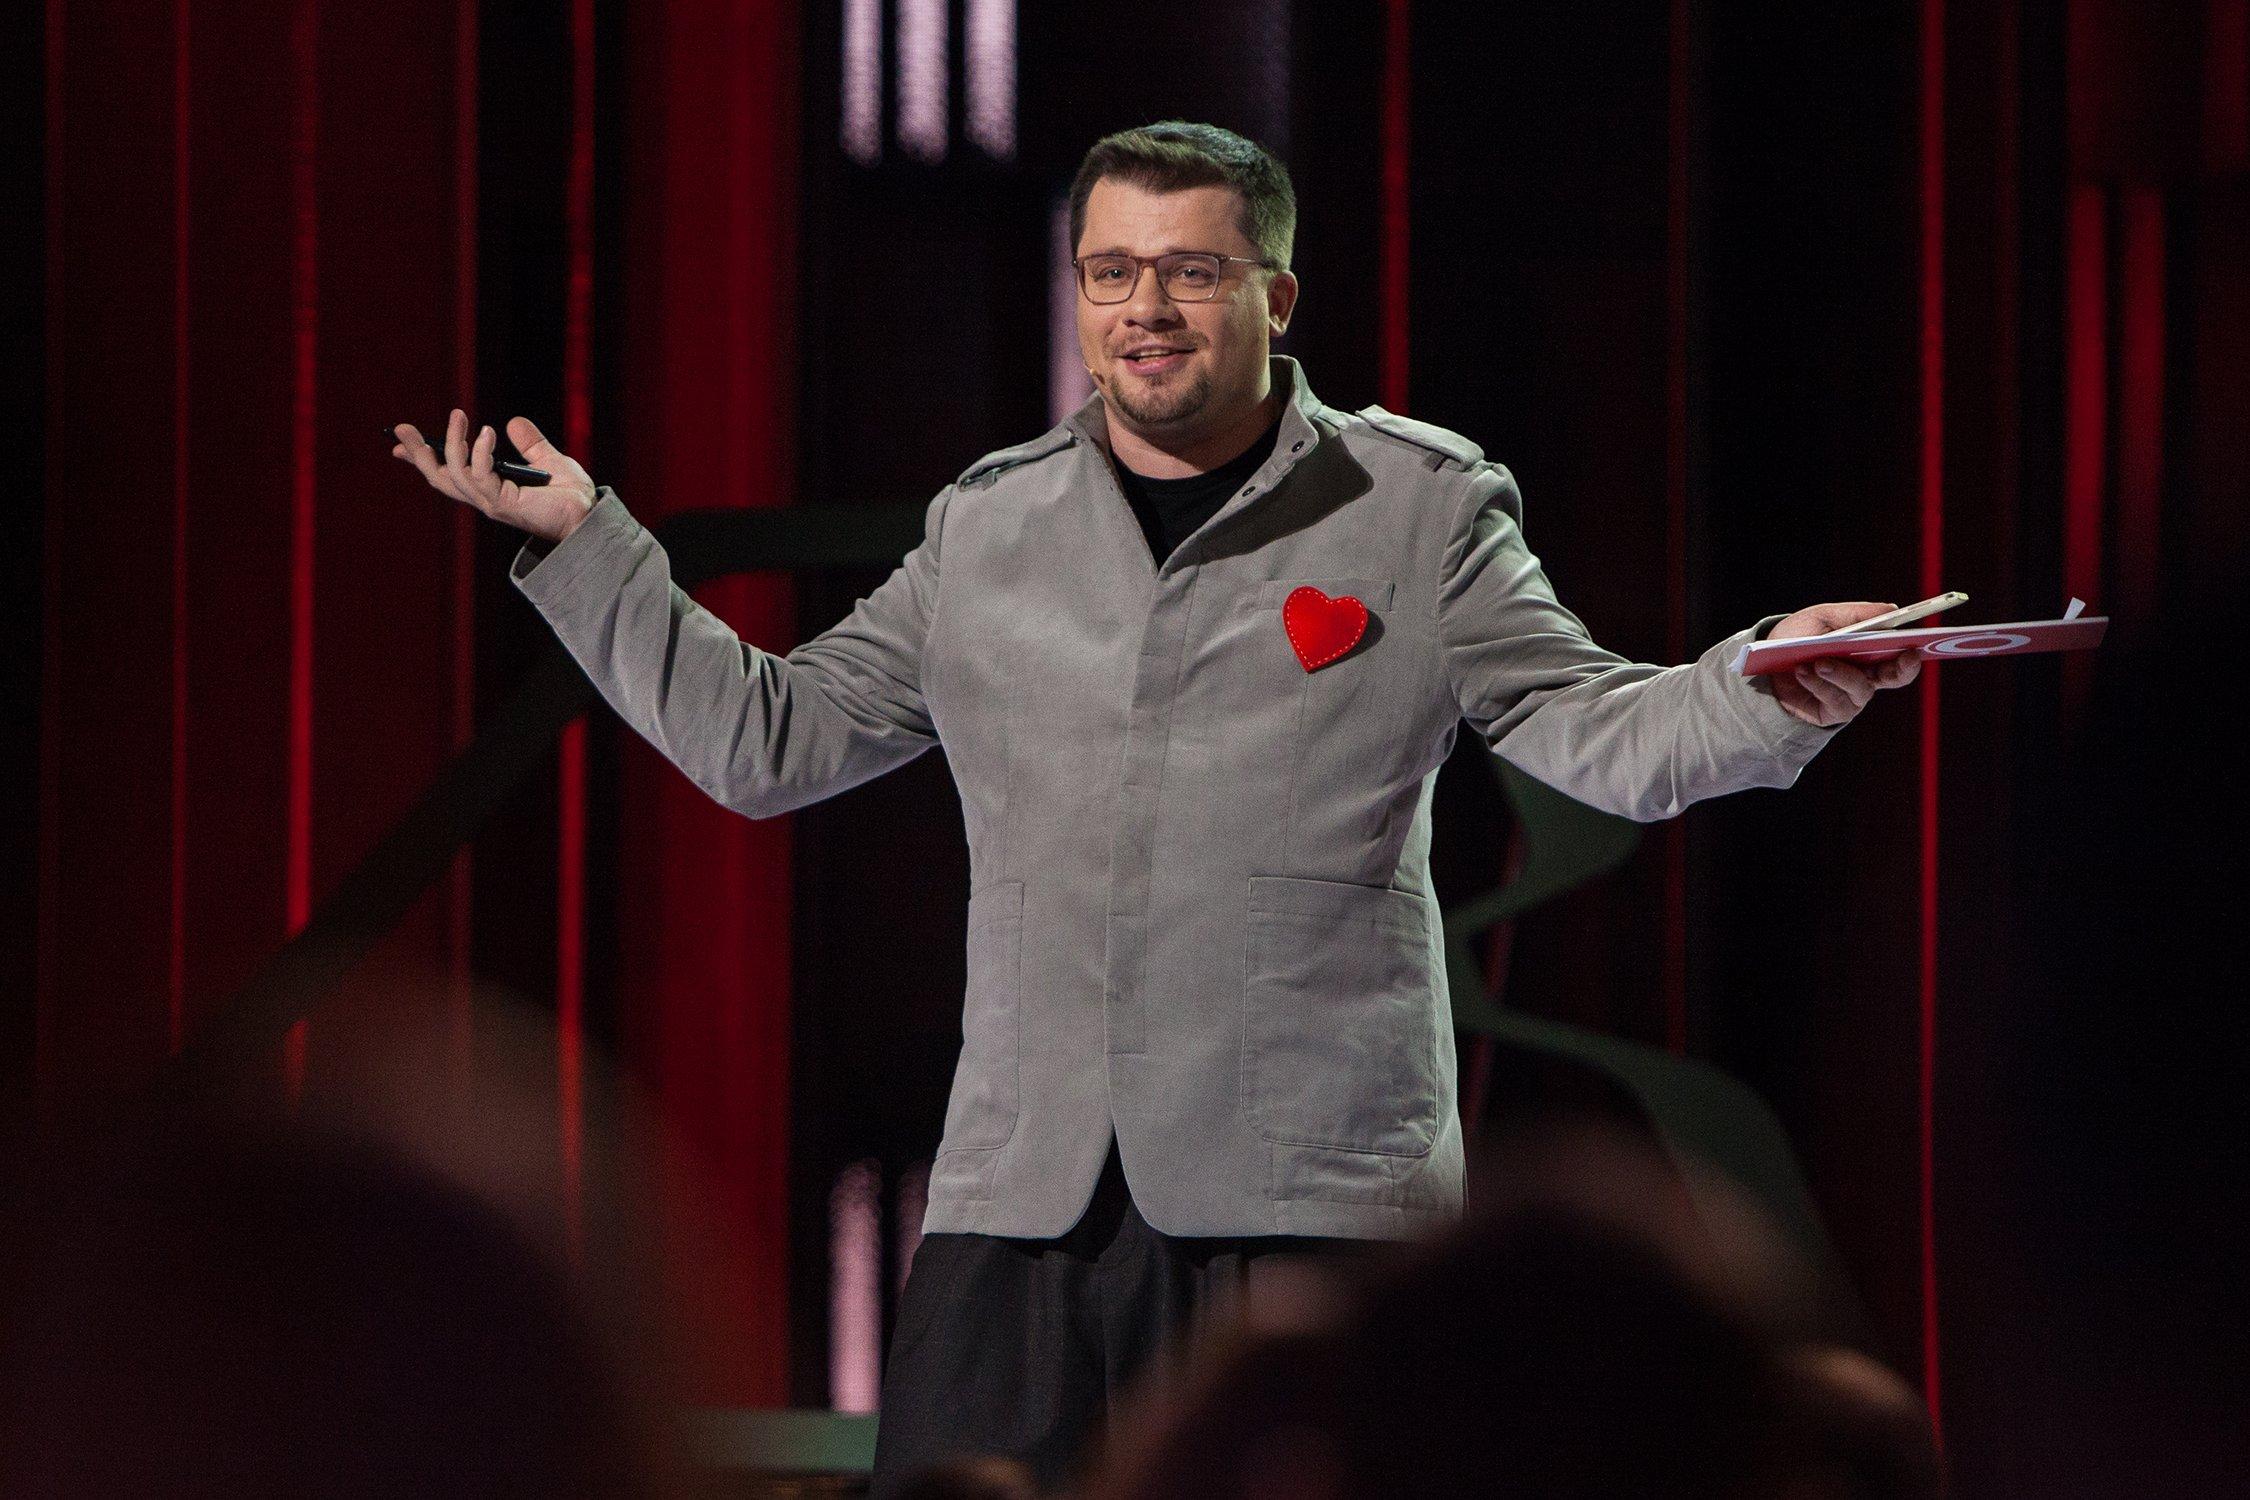 Гарик Харламов анонсировал возвращение Comedy Club